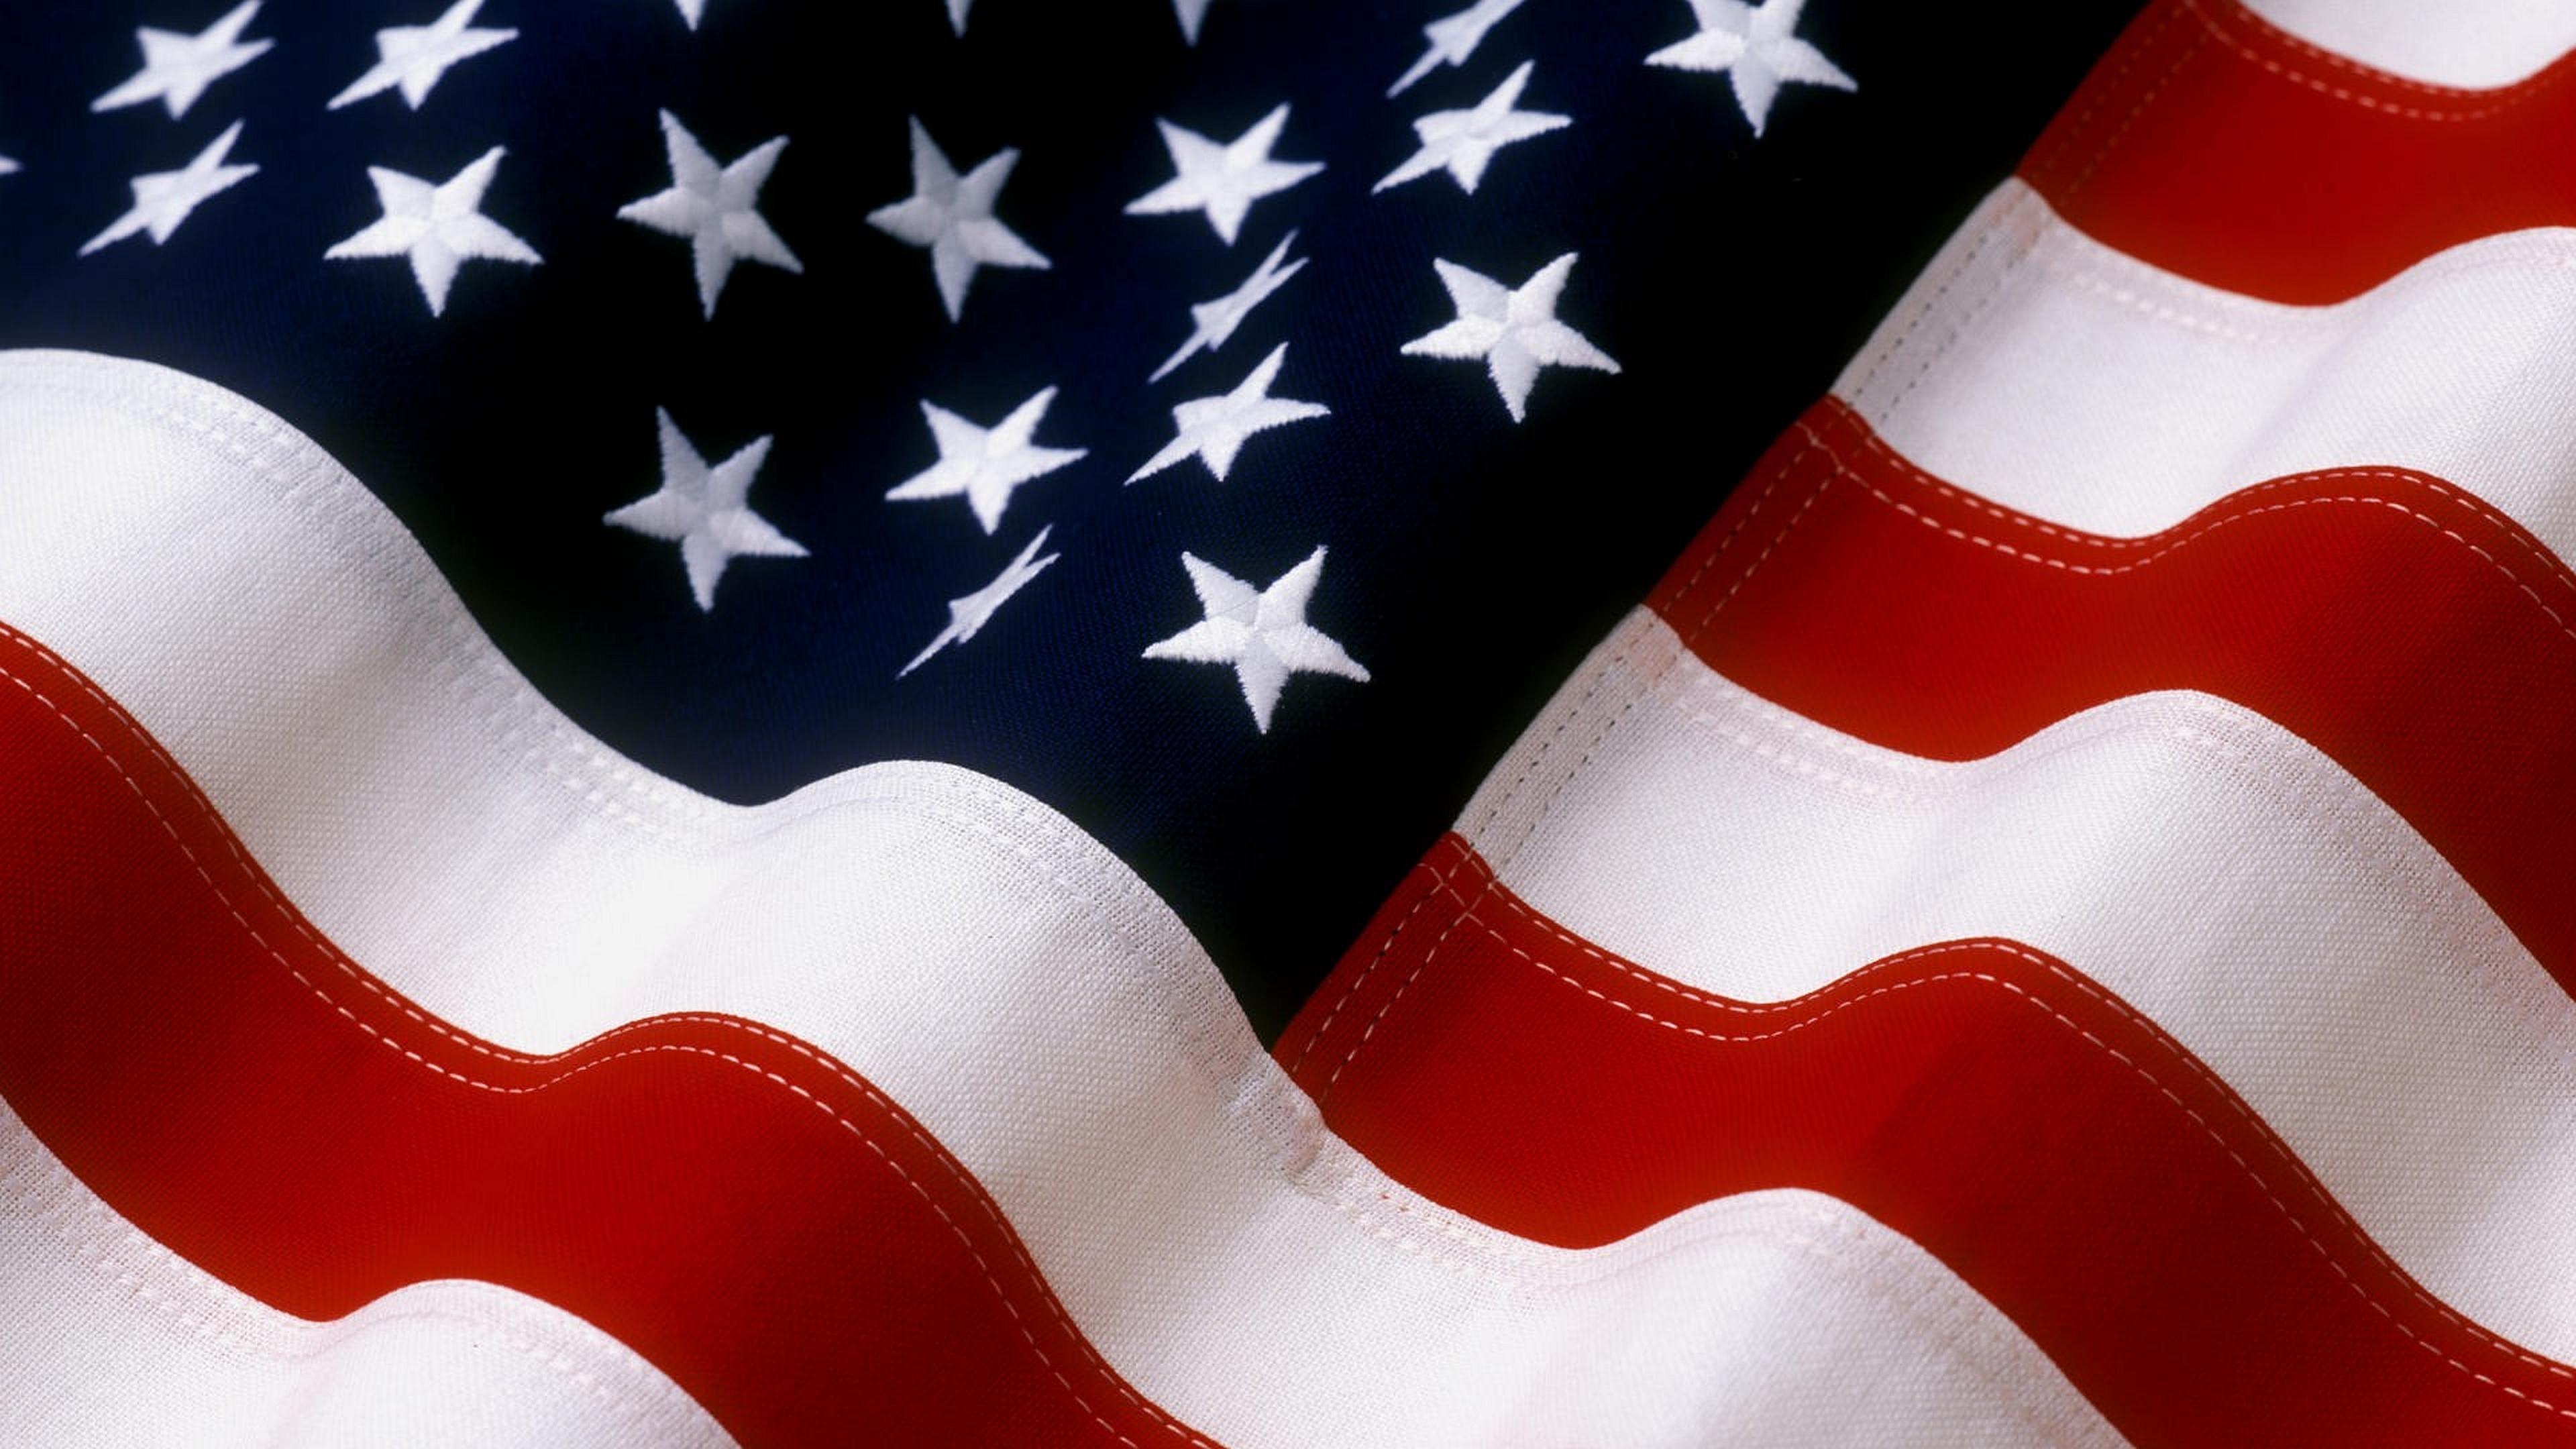 American Flag Computer Wallpapers Desktop Backgrounds 3840x2160 3840x2160